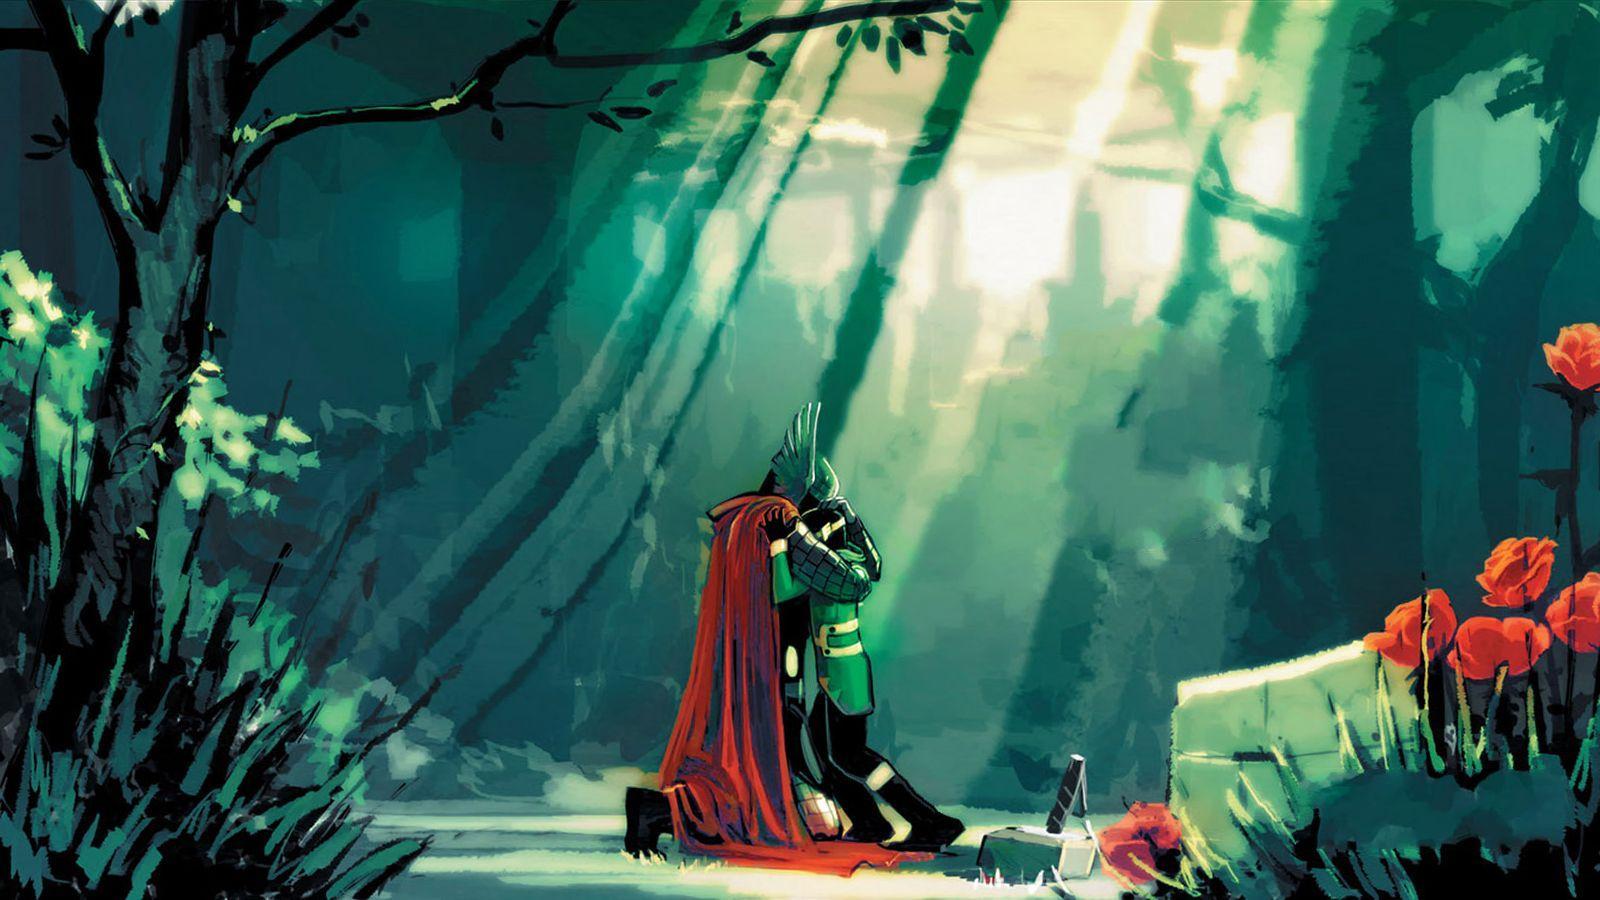 Loki Marvel Laptop Wallpapers Top Free Loki Marvel Laptop Backgrounds Wallpaperaccess